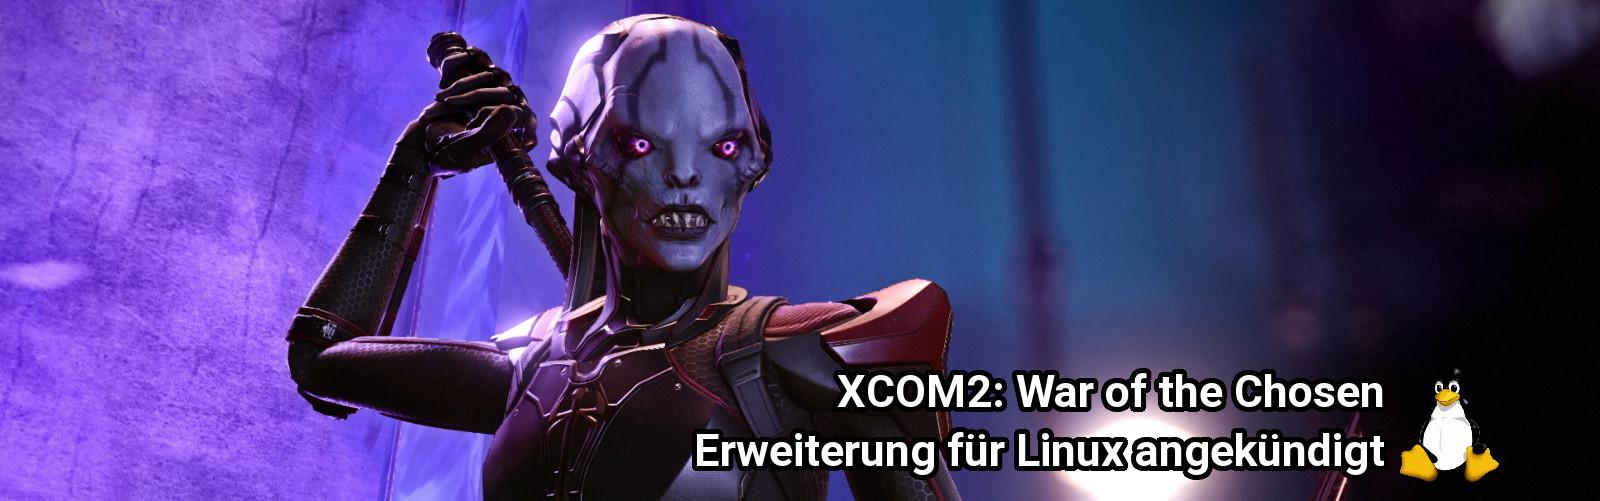 https://www.holarse-linuxgaming.de/sites/default/files/2017-06-13-1/xcom2_wotc_teaser.jpg